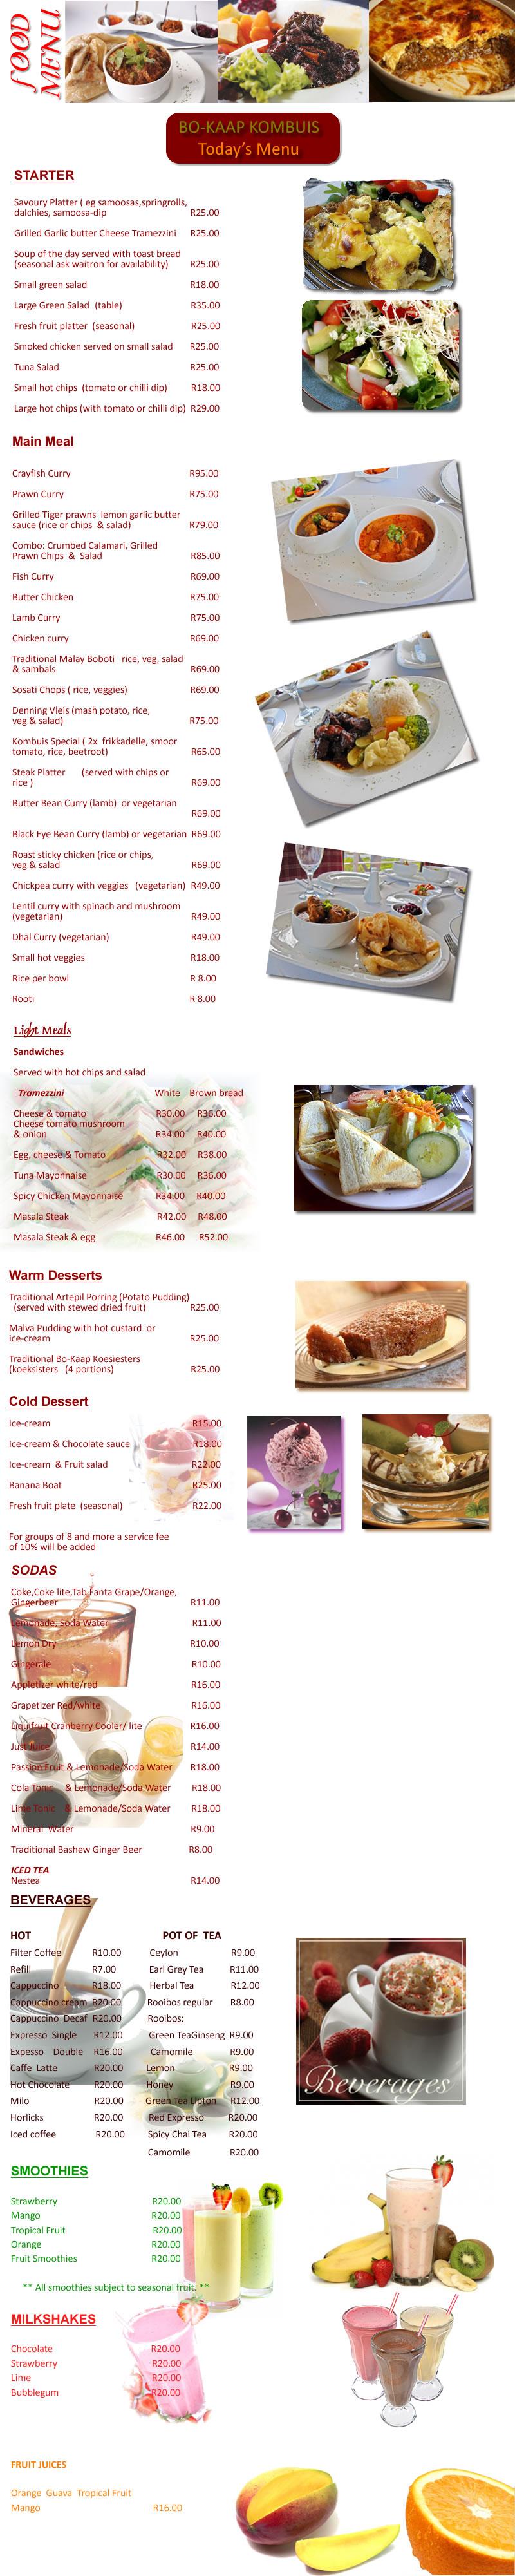 Bo-Kaap Kombuis - Restaurant in Cape Town - EatOut